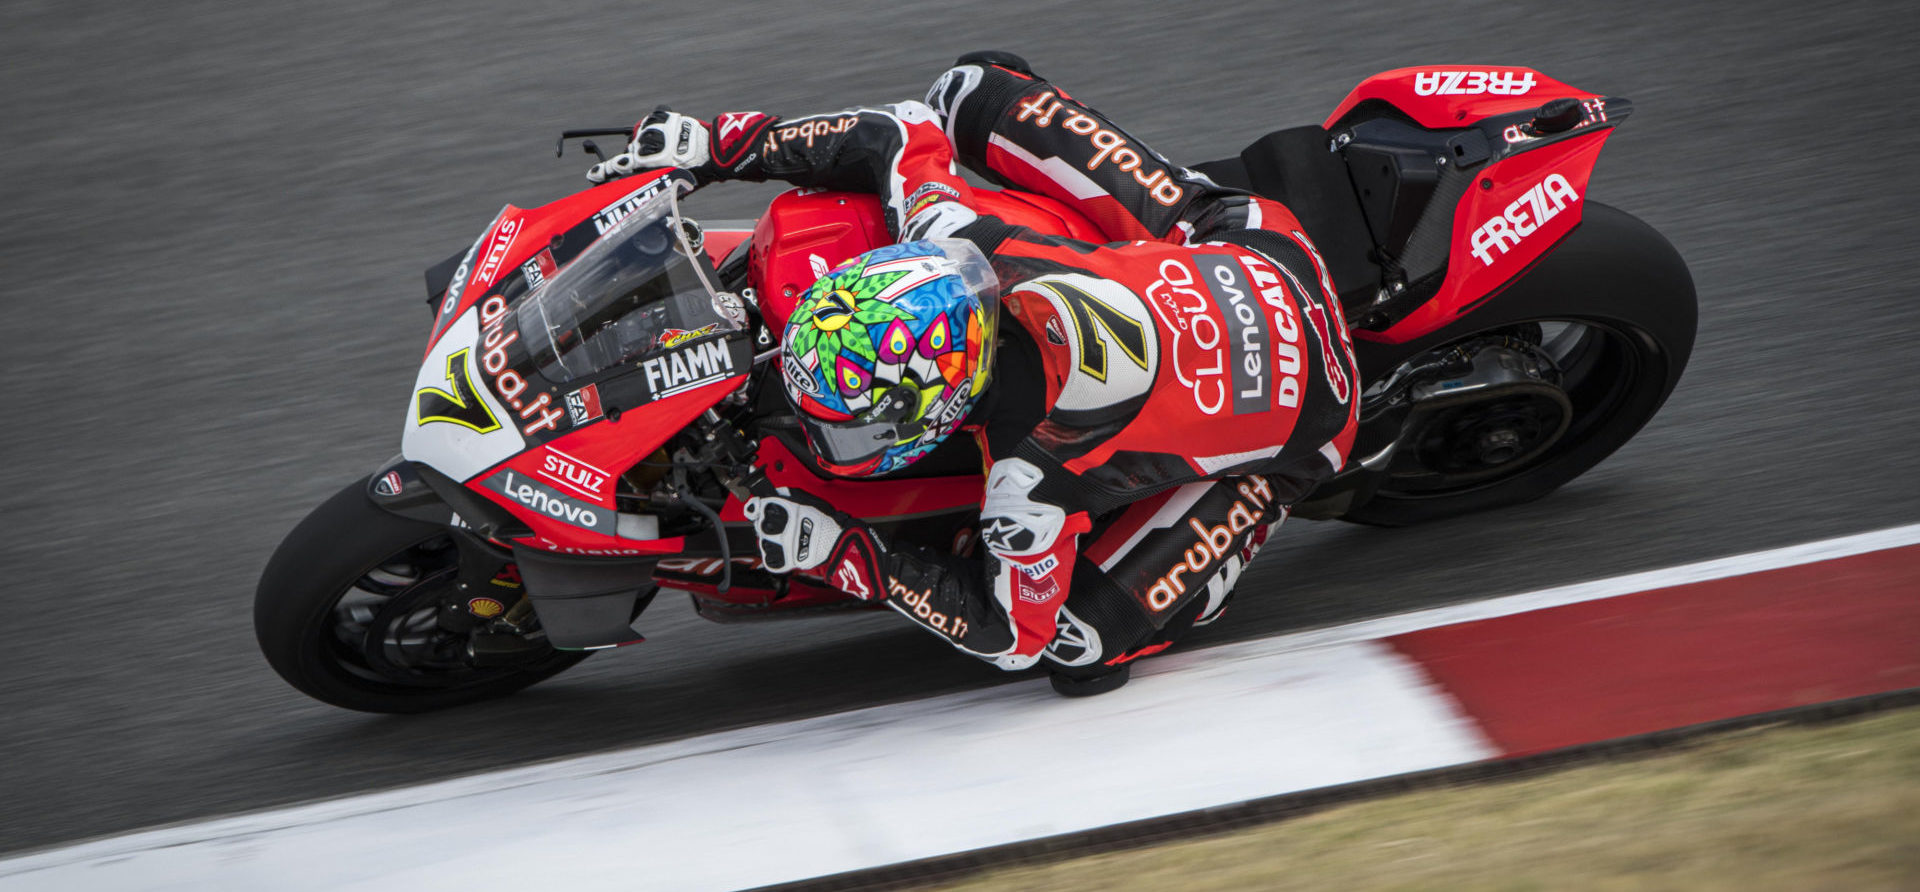 Chaz Davies (7). Photo courtesy Ducati.